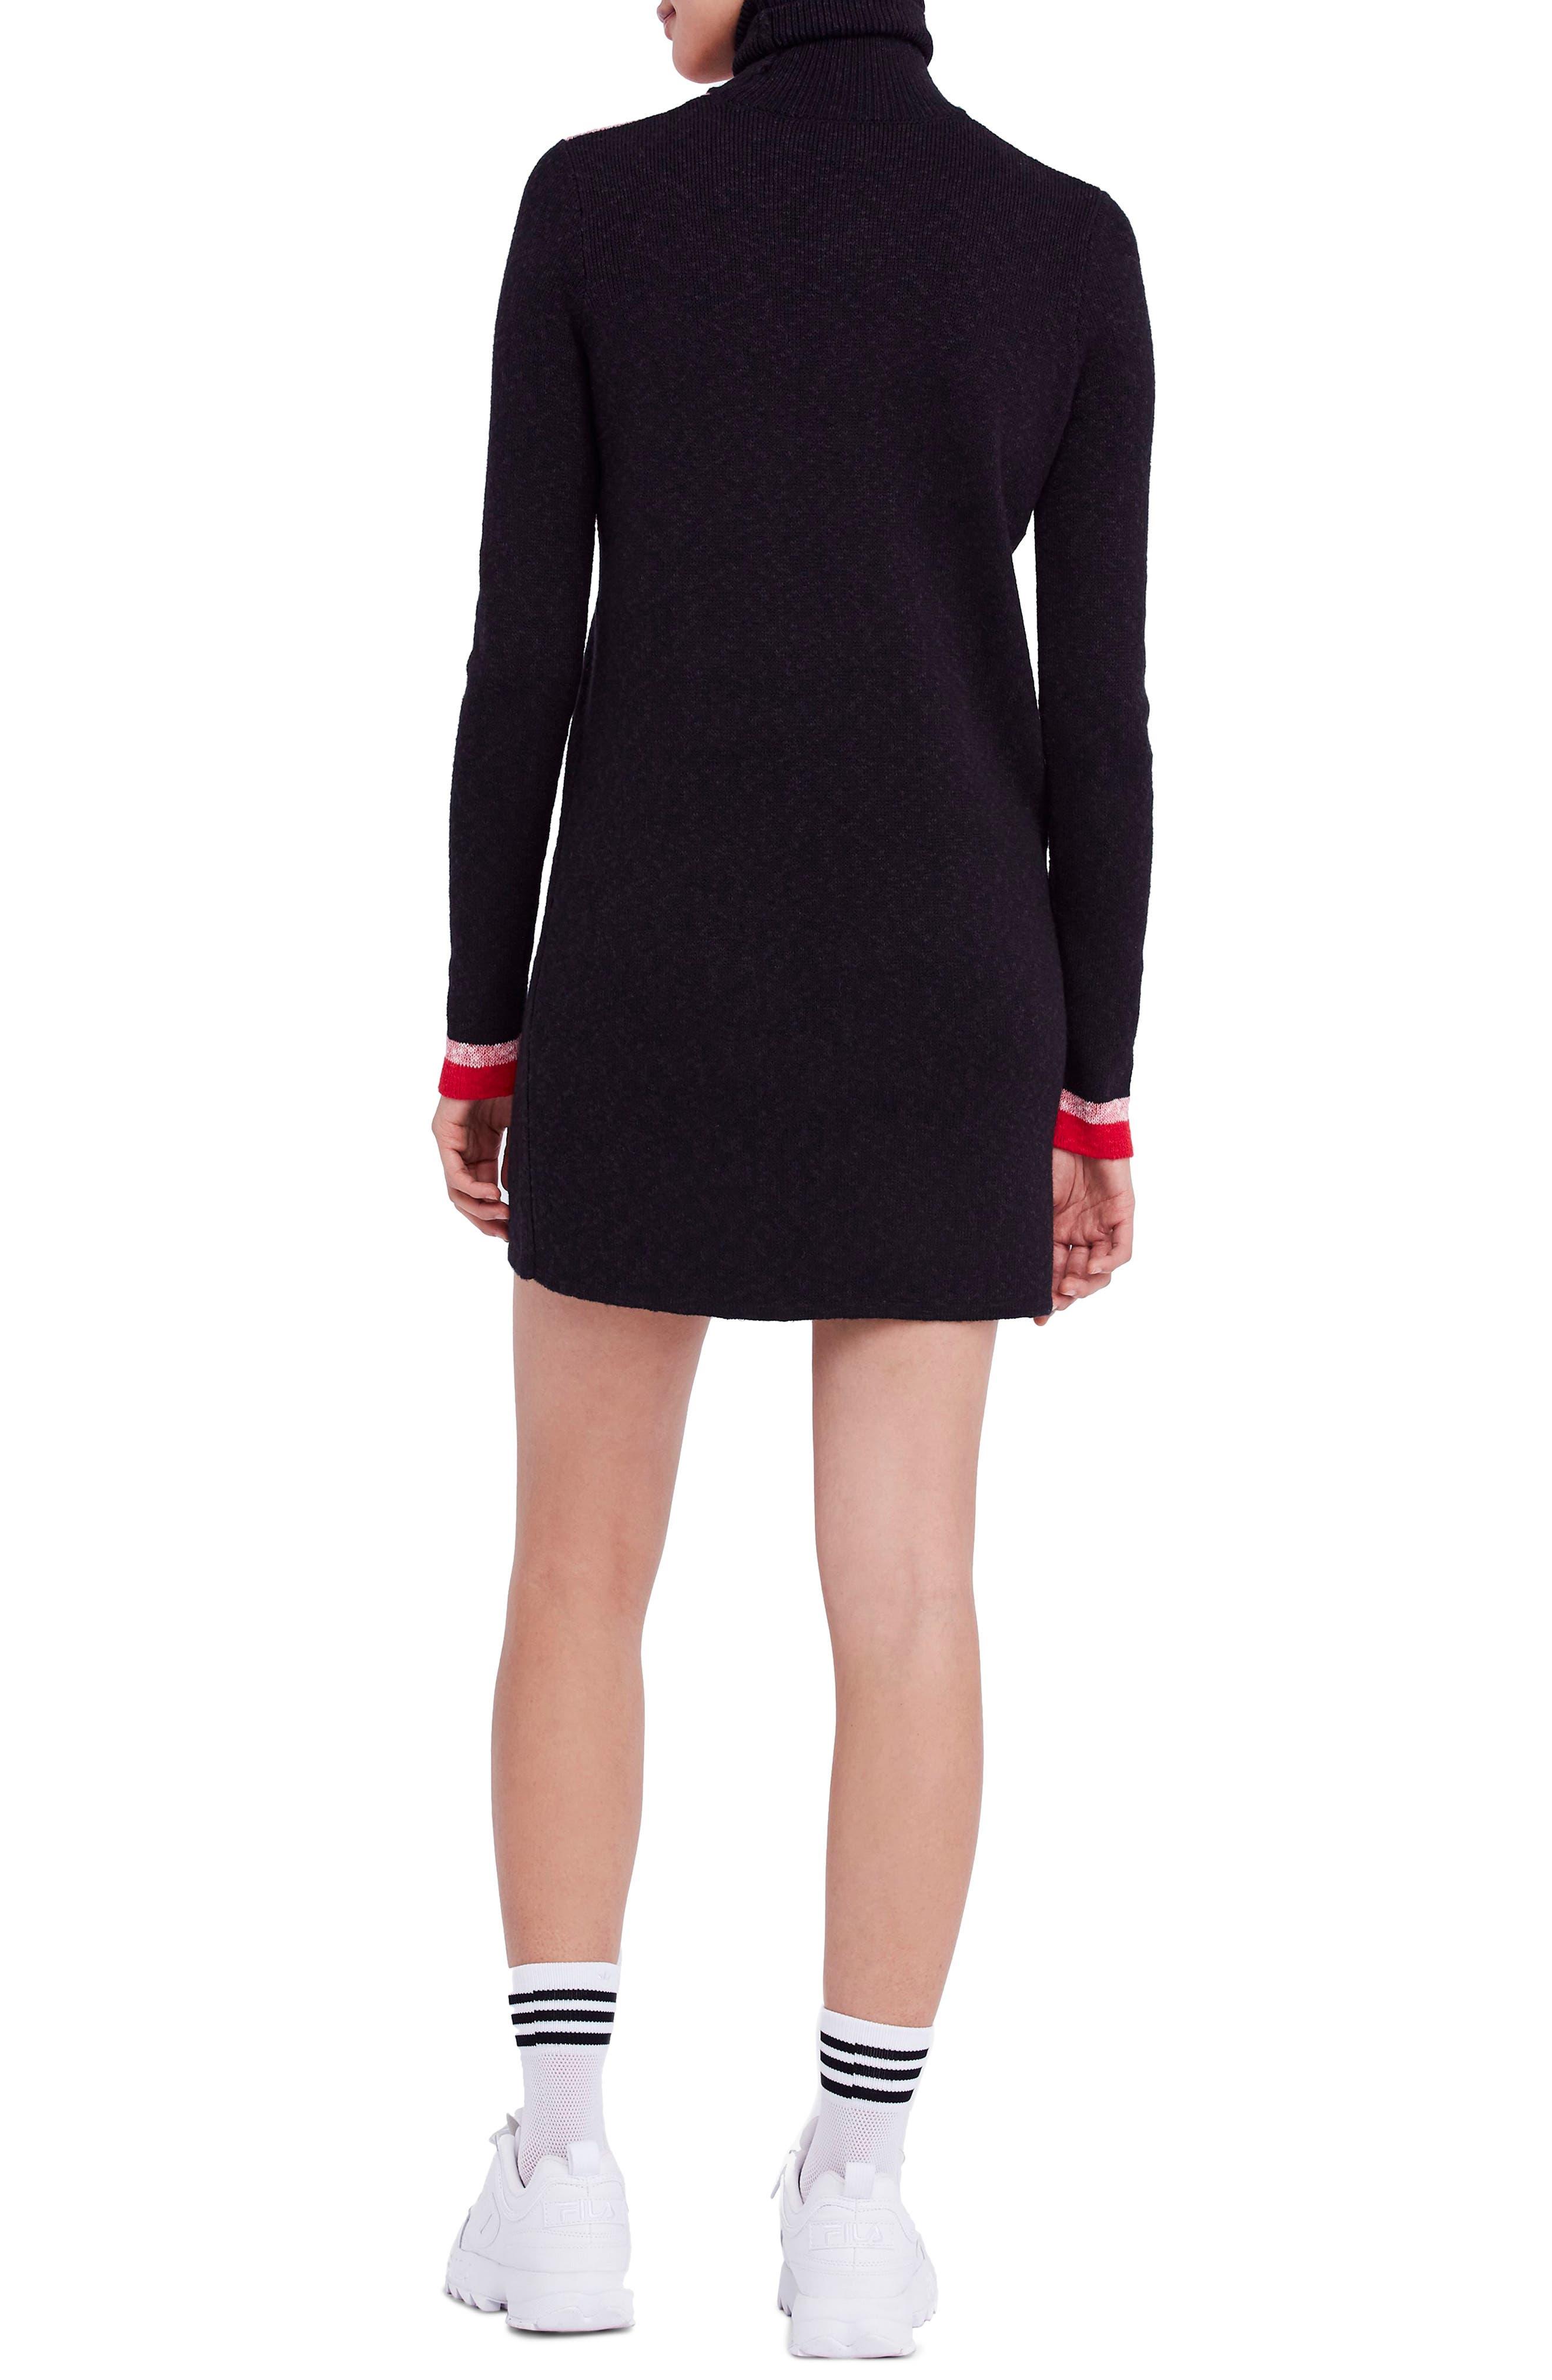 Winter Break Sweater Dress,                             Alternate thumbnail 2, color,                             001